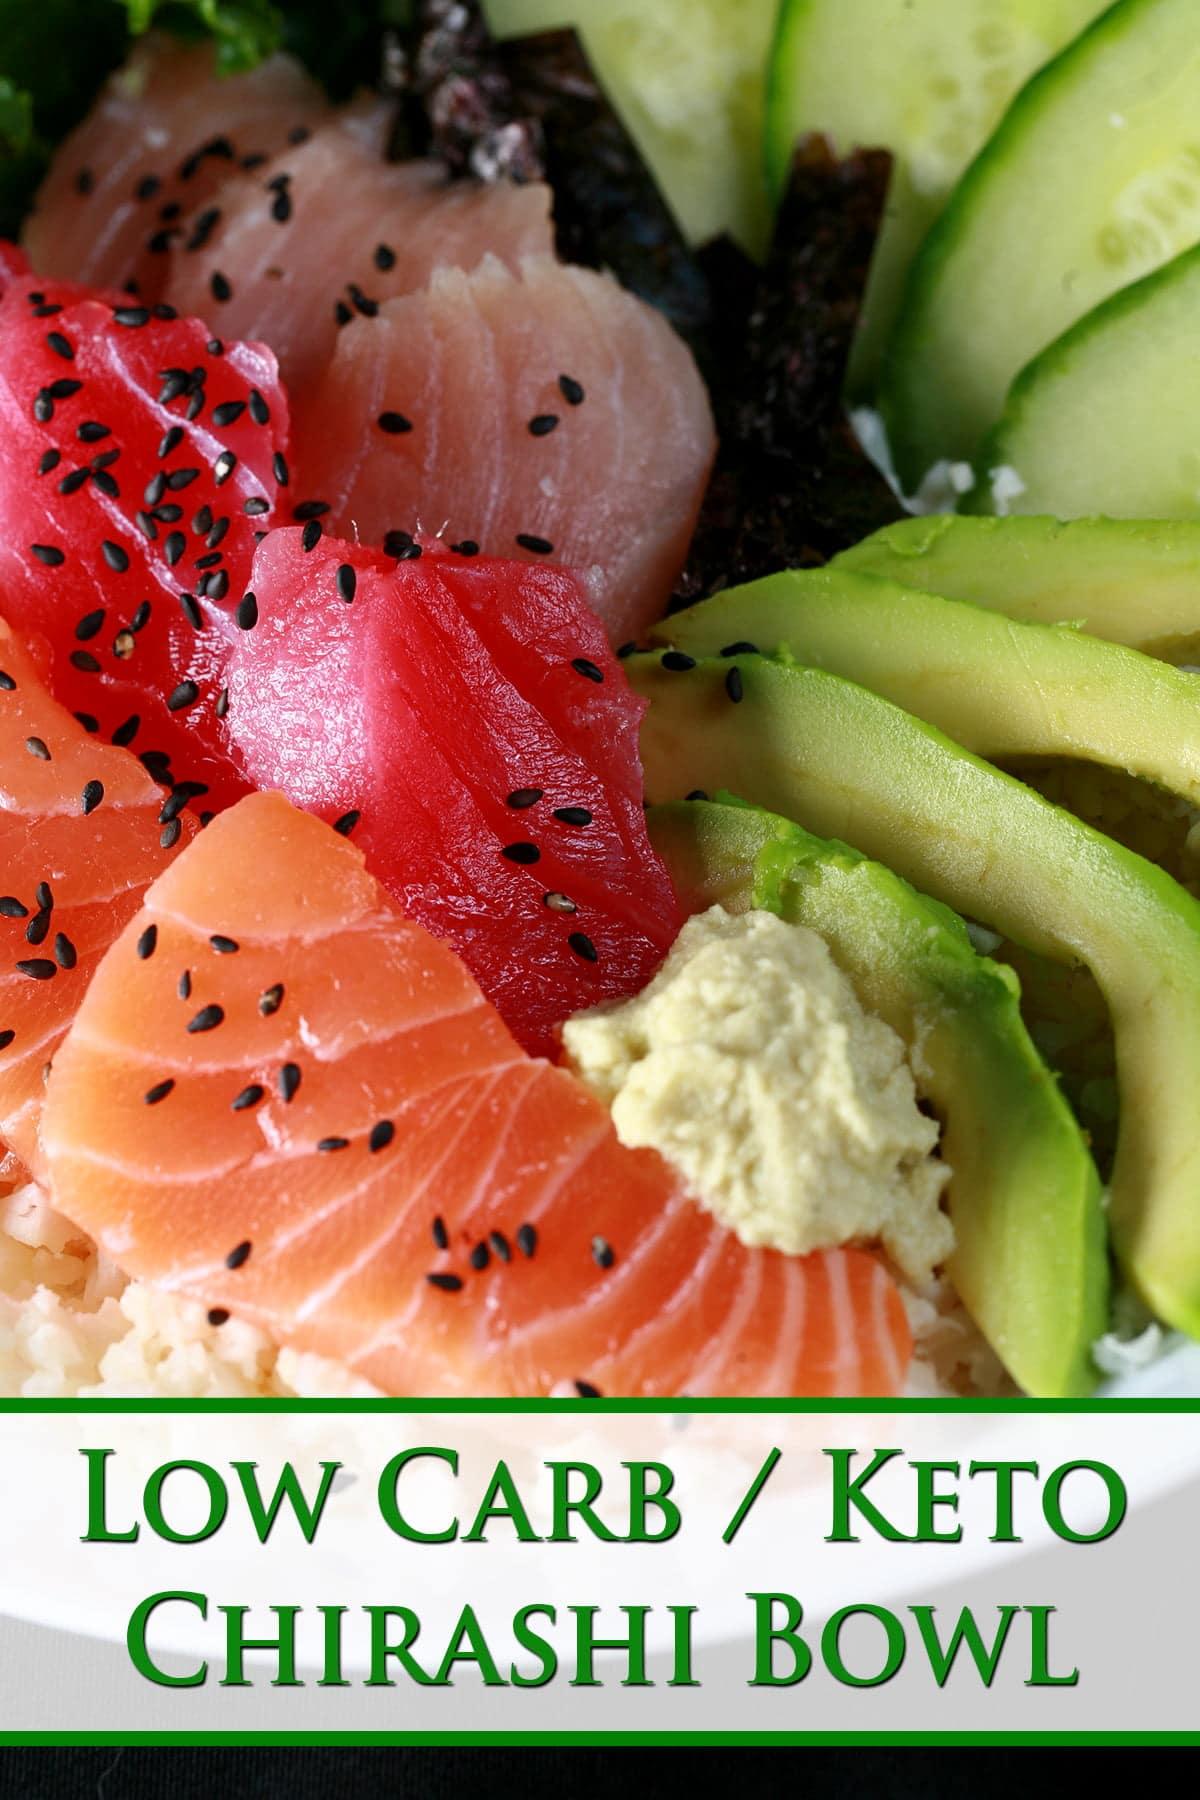 A bowl of various cuts of sashini and vegetables. Green text overlay saus Low carb keto chirashi bowl.